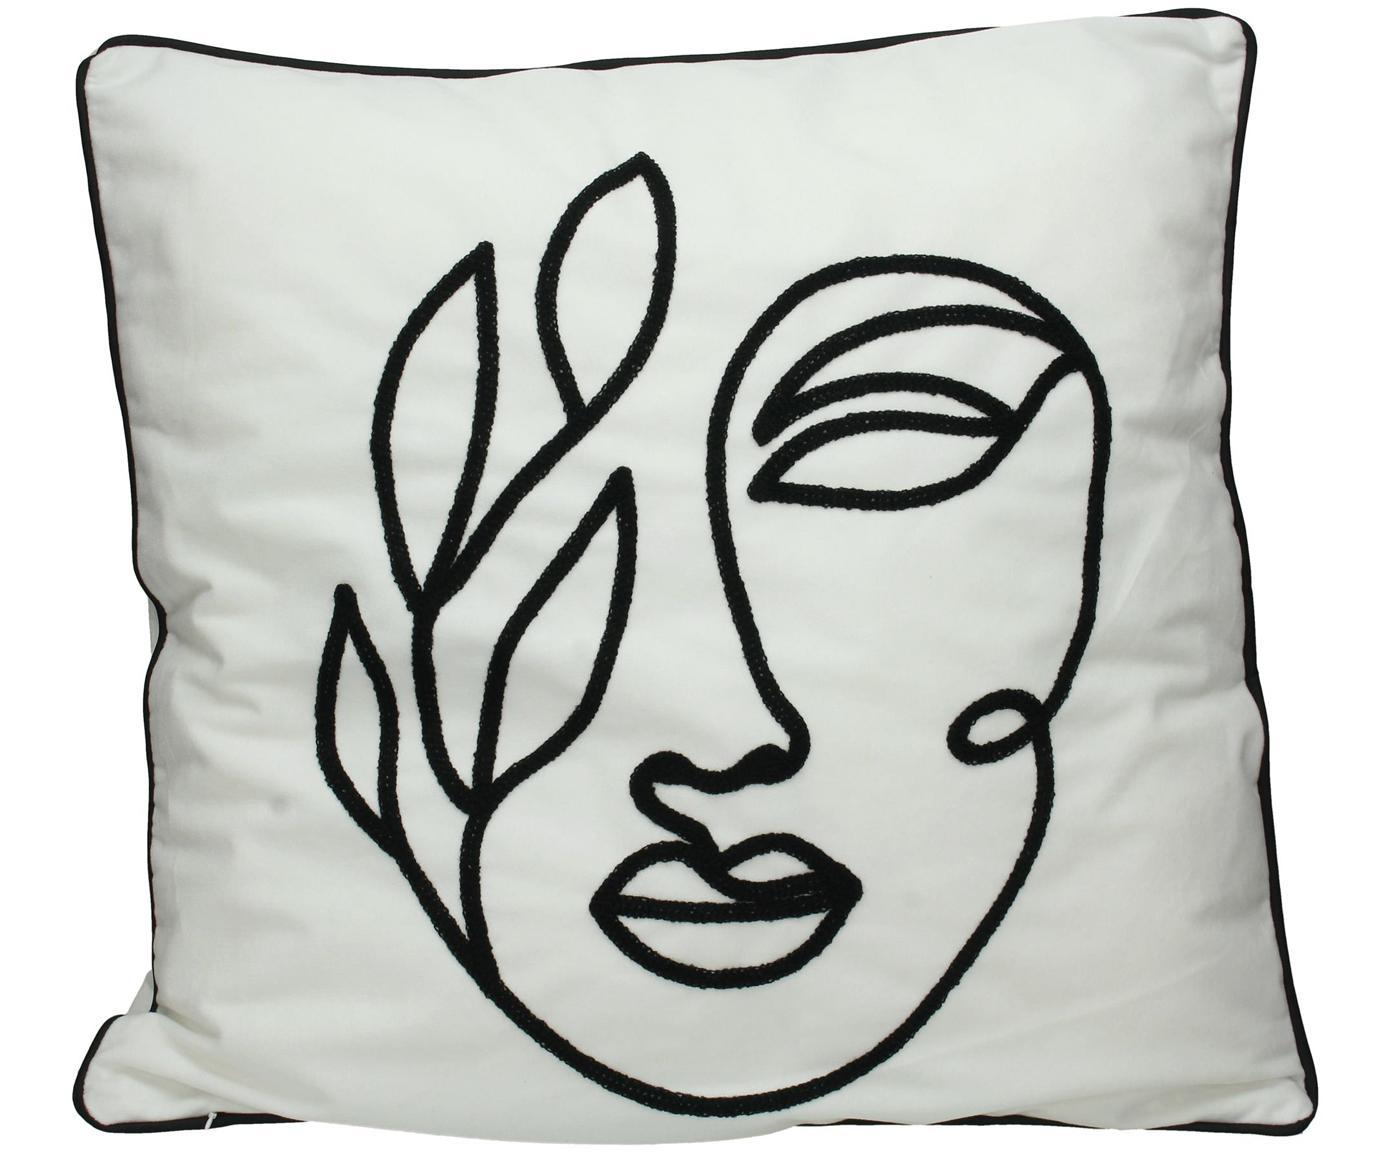 Fluwelen kussen Face met abstracte One Line tekening, met vulling, Polyester fluweel, Wit, zwart, 50 x 50 cm